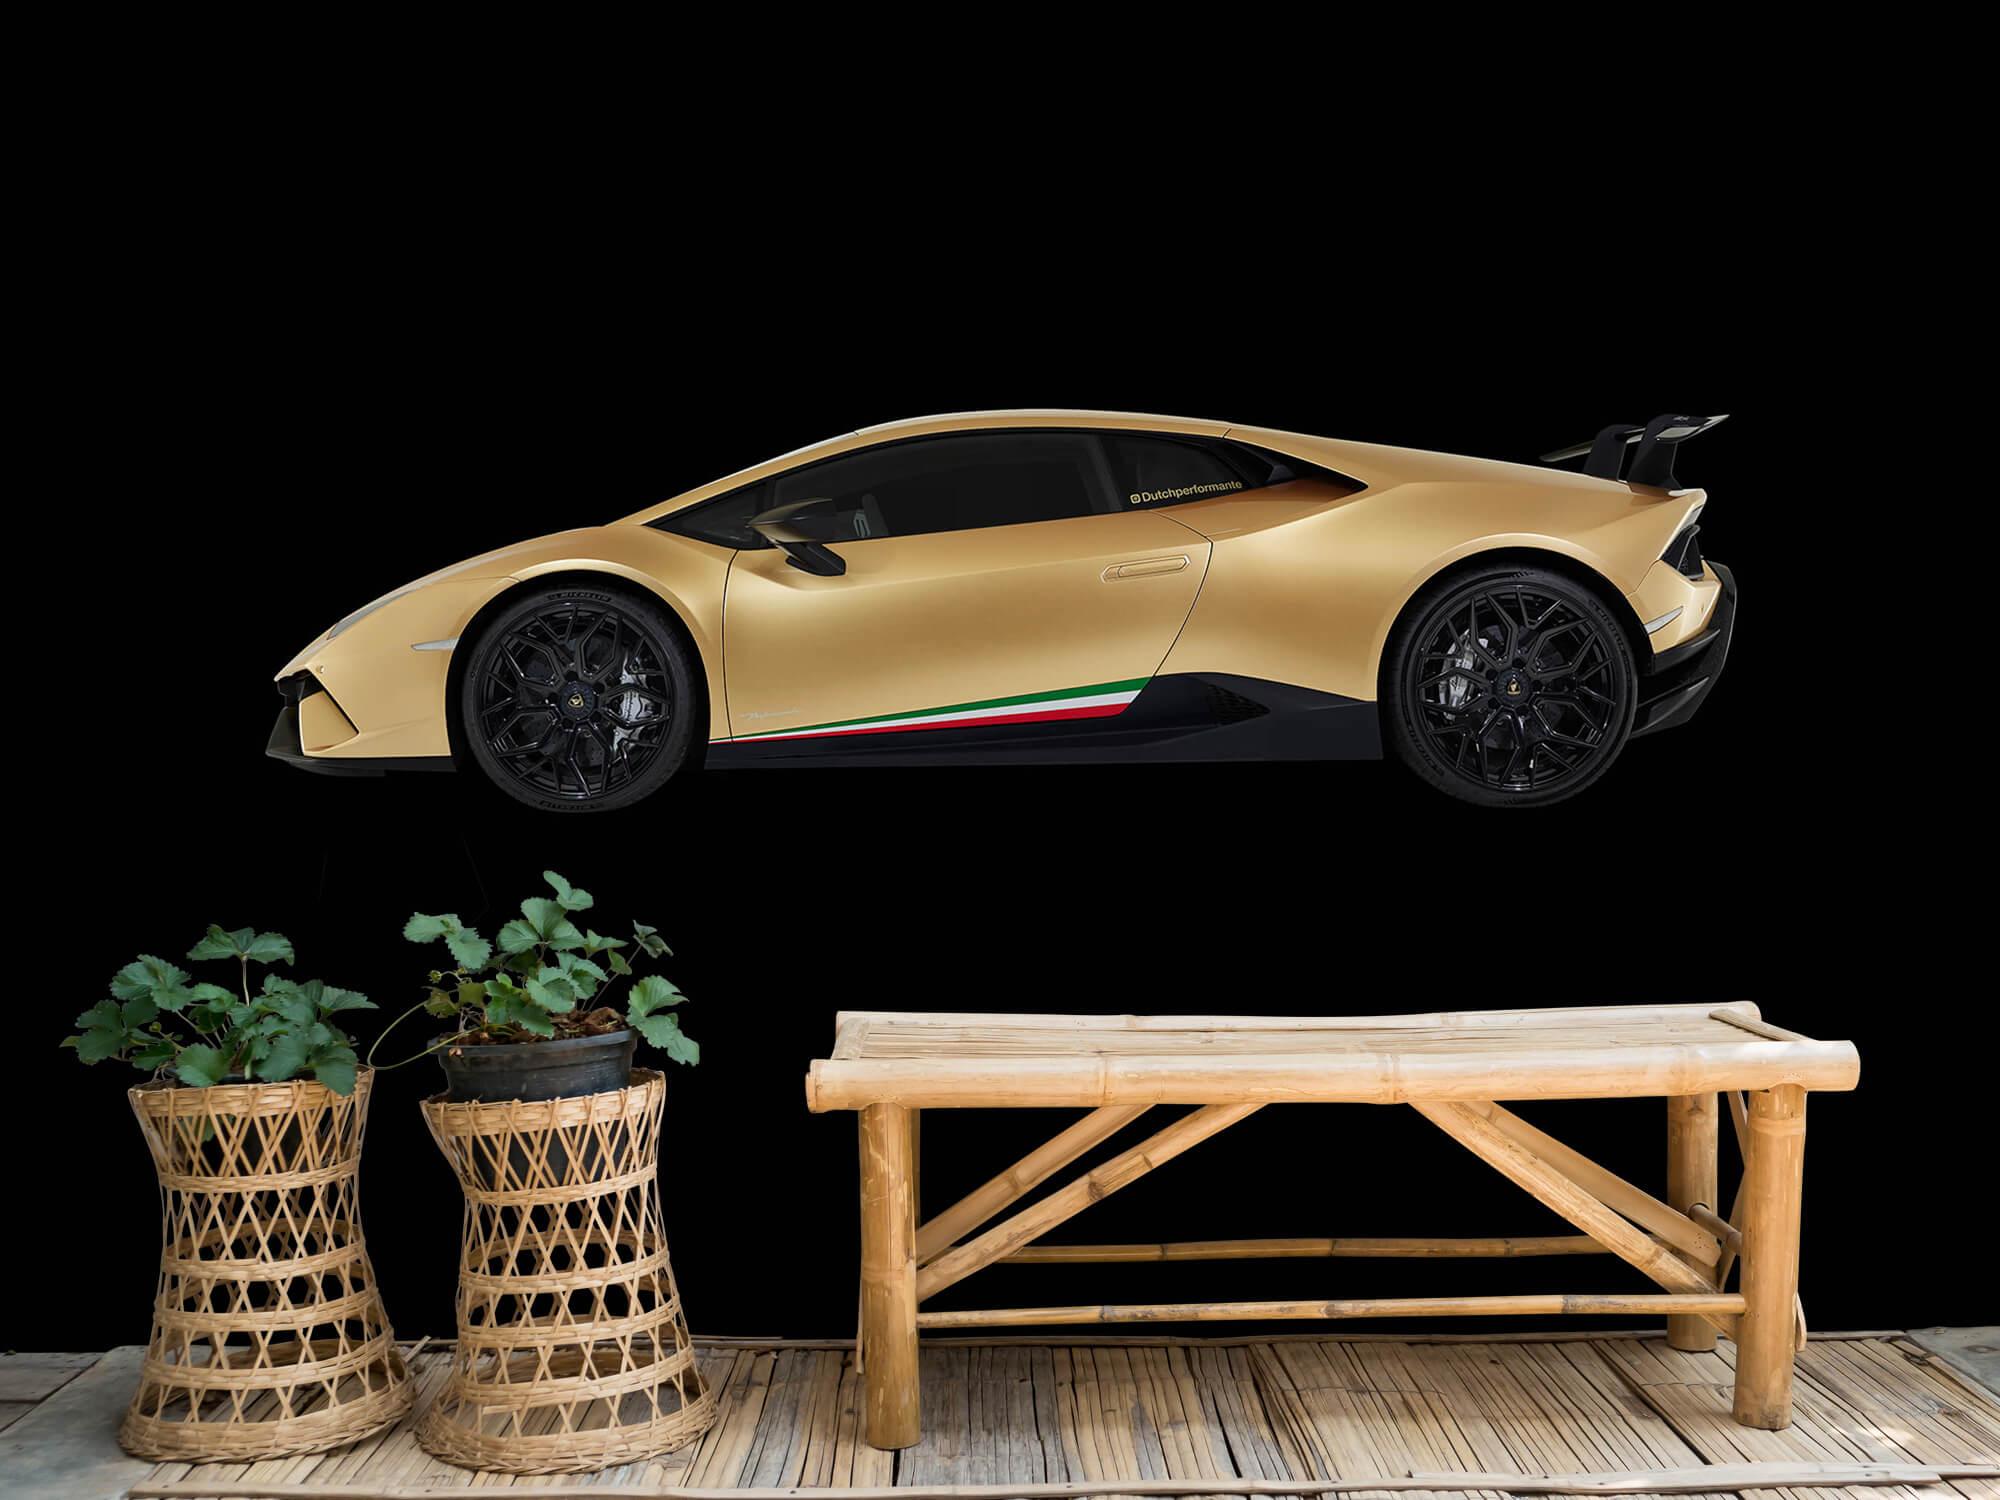 Wallpaper Lamborghini Huracán - Zijkant, zwart 10